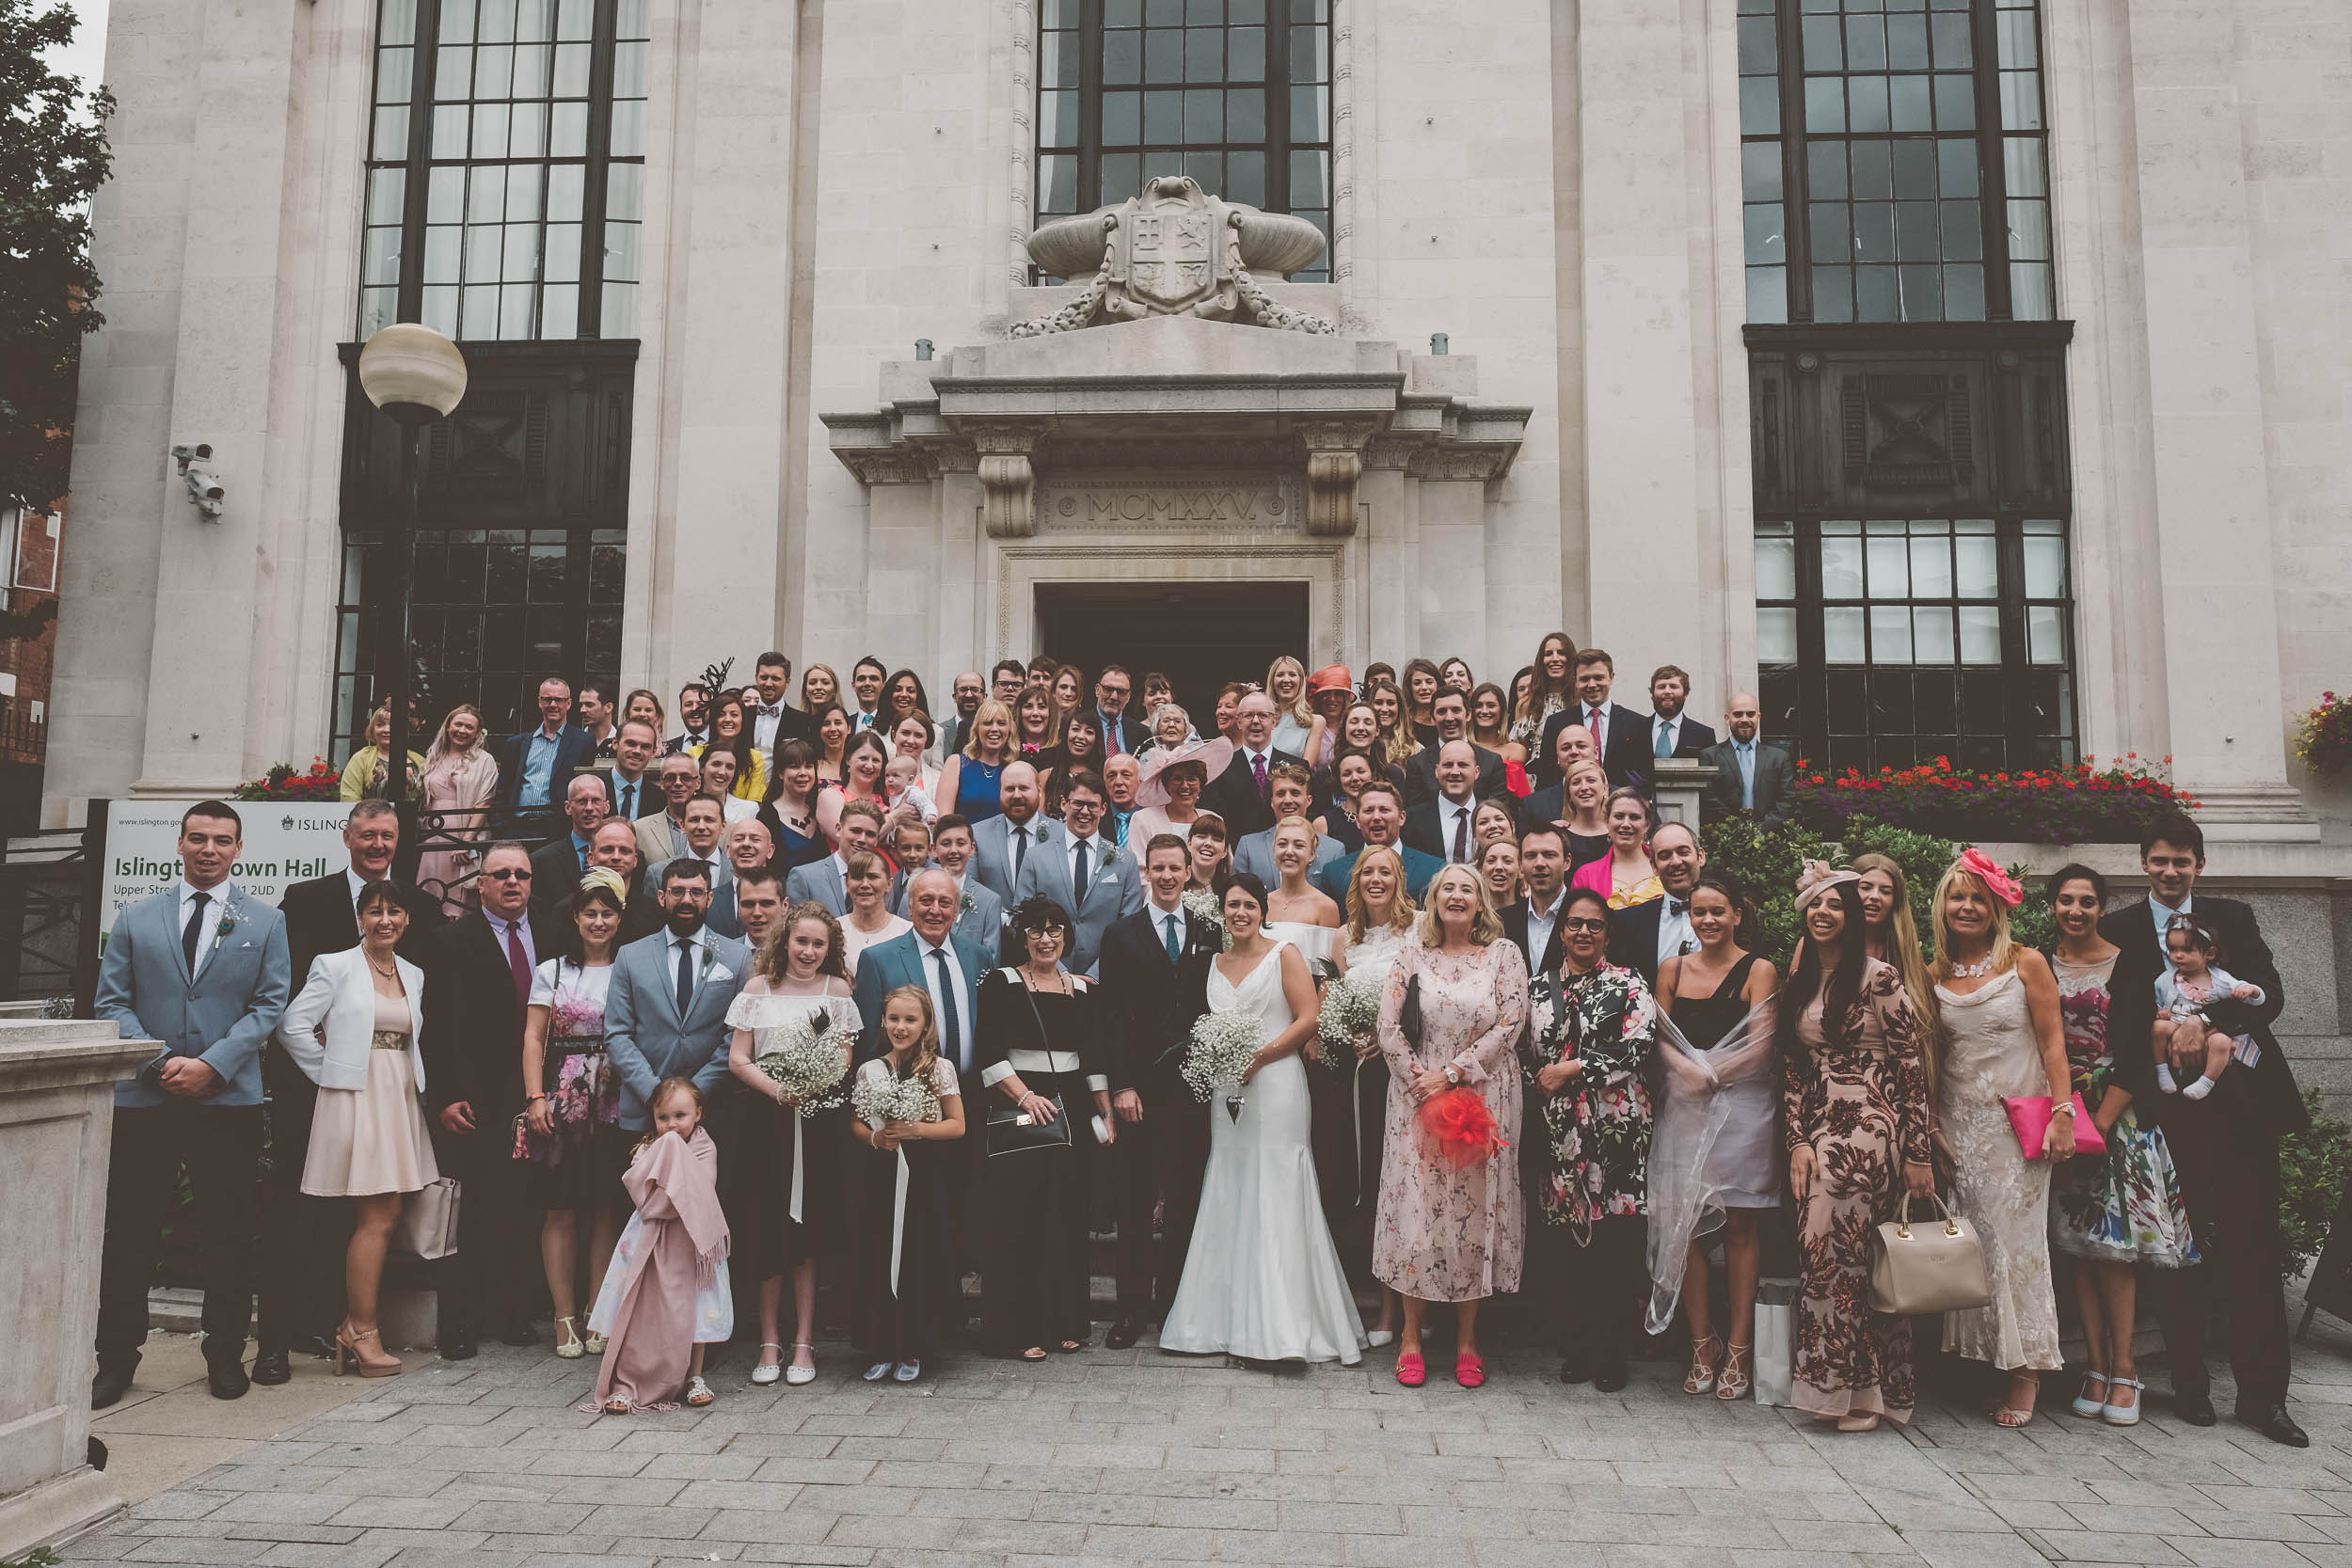 islington-town-hall-4th-floor-studios-wedding167.jpg